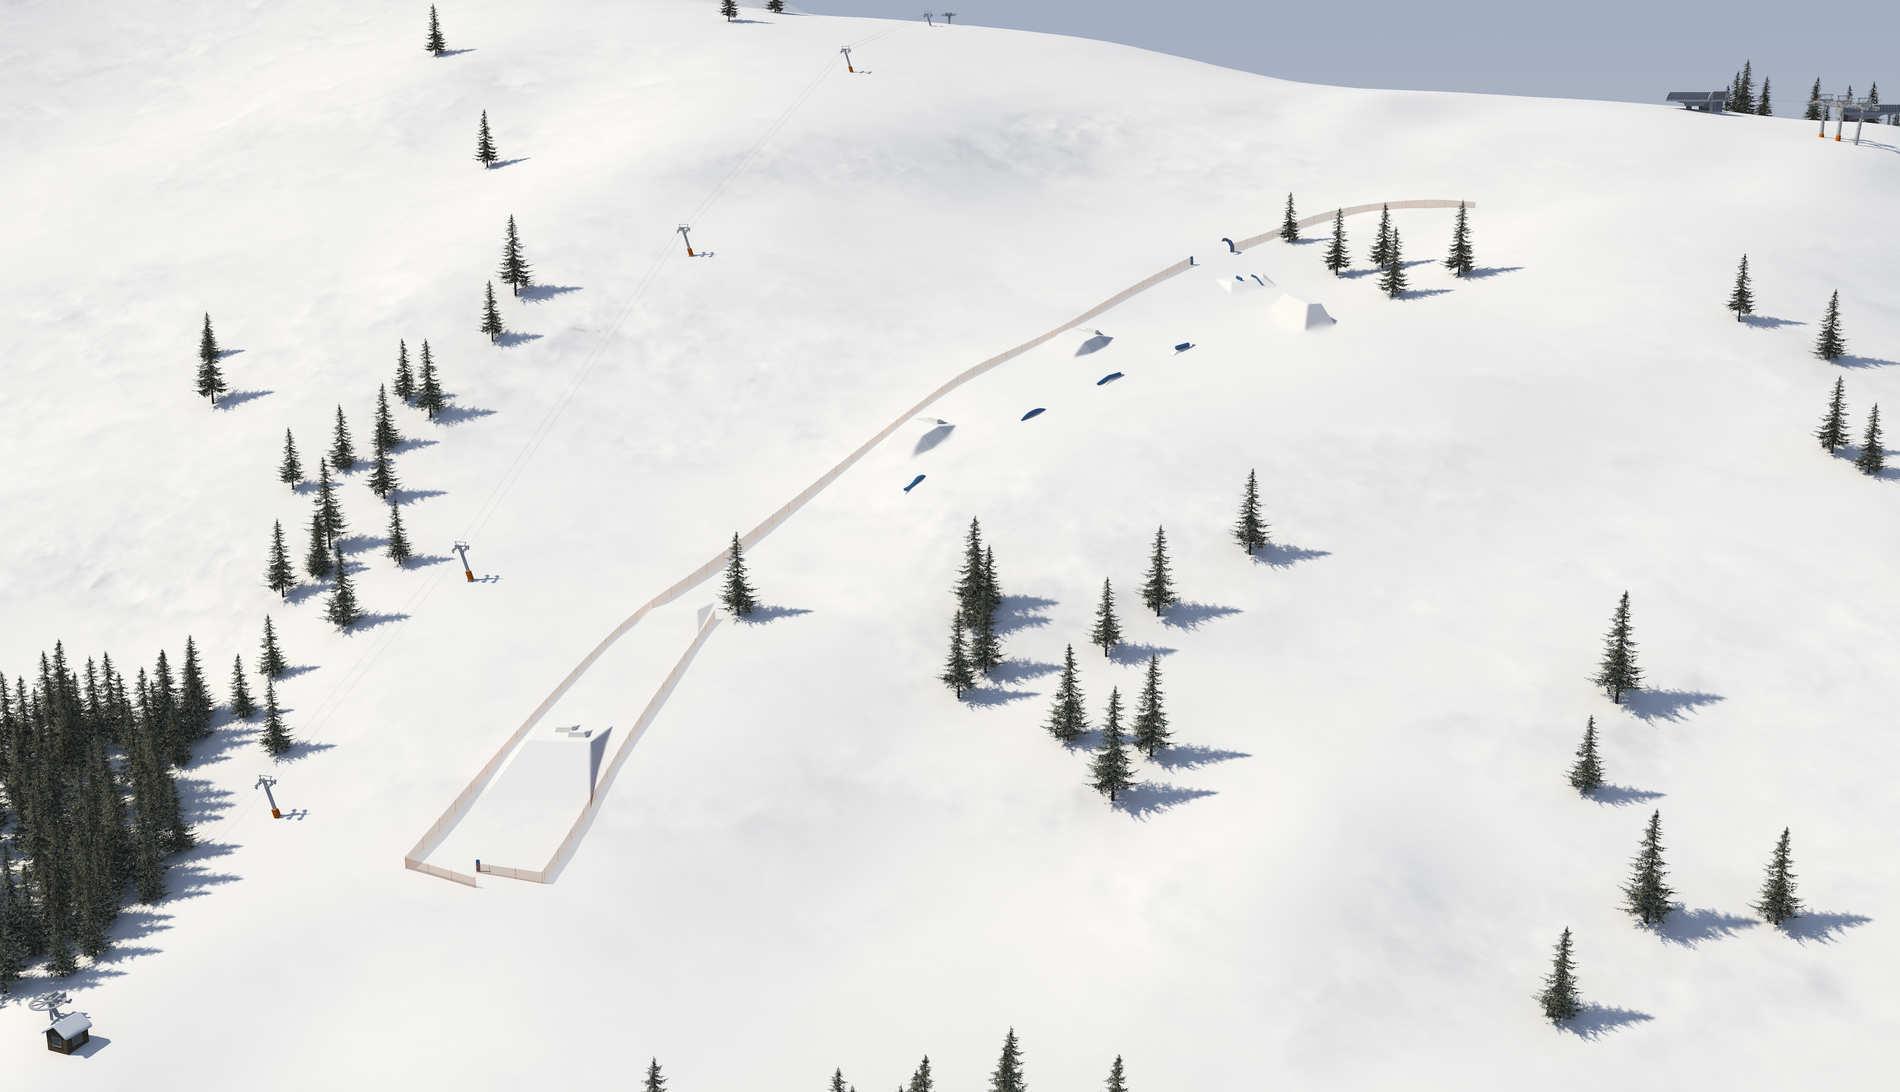 160812 alpbach snowpark clean